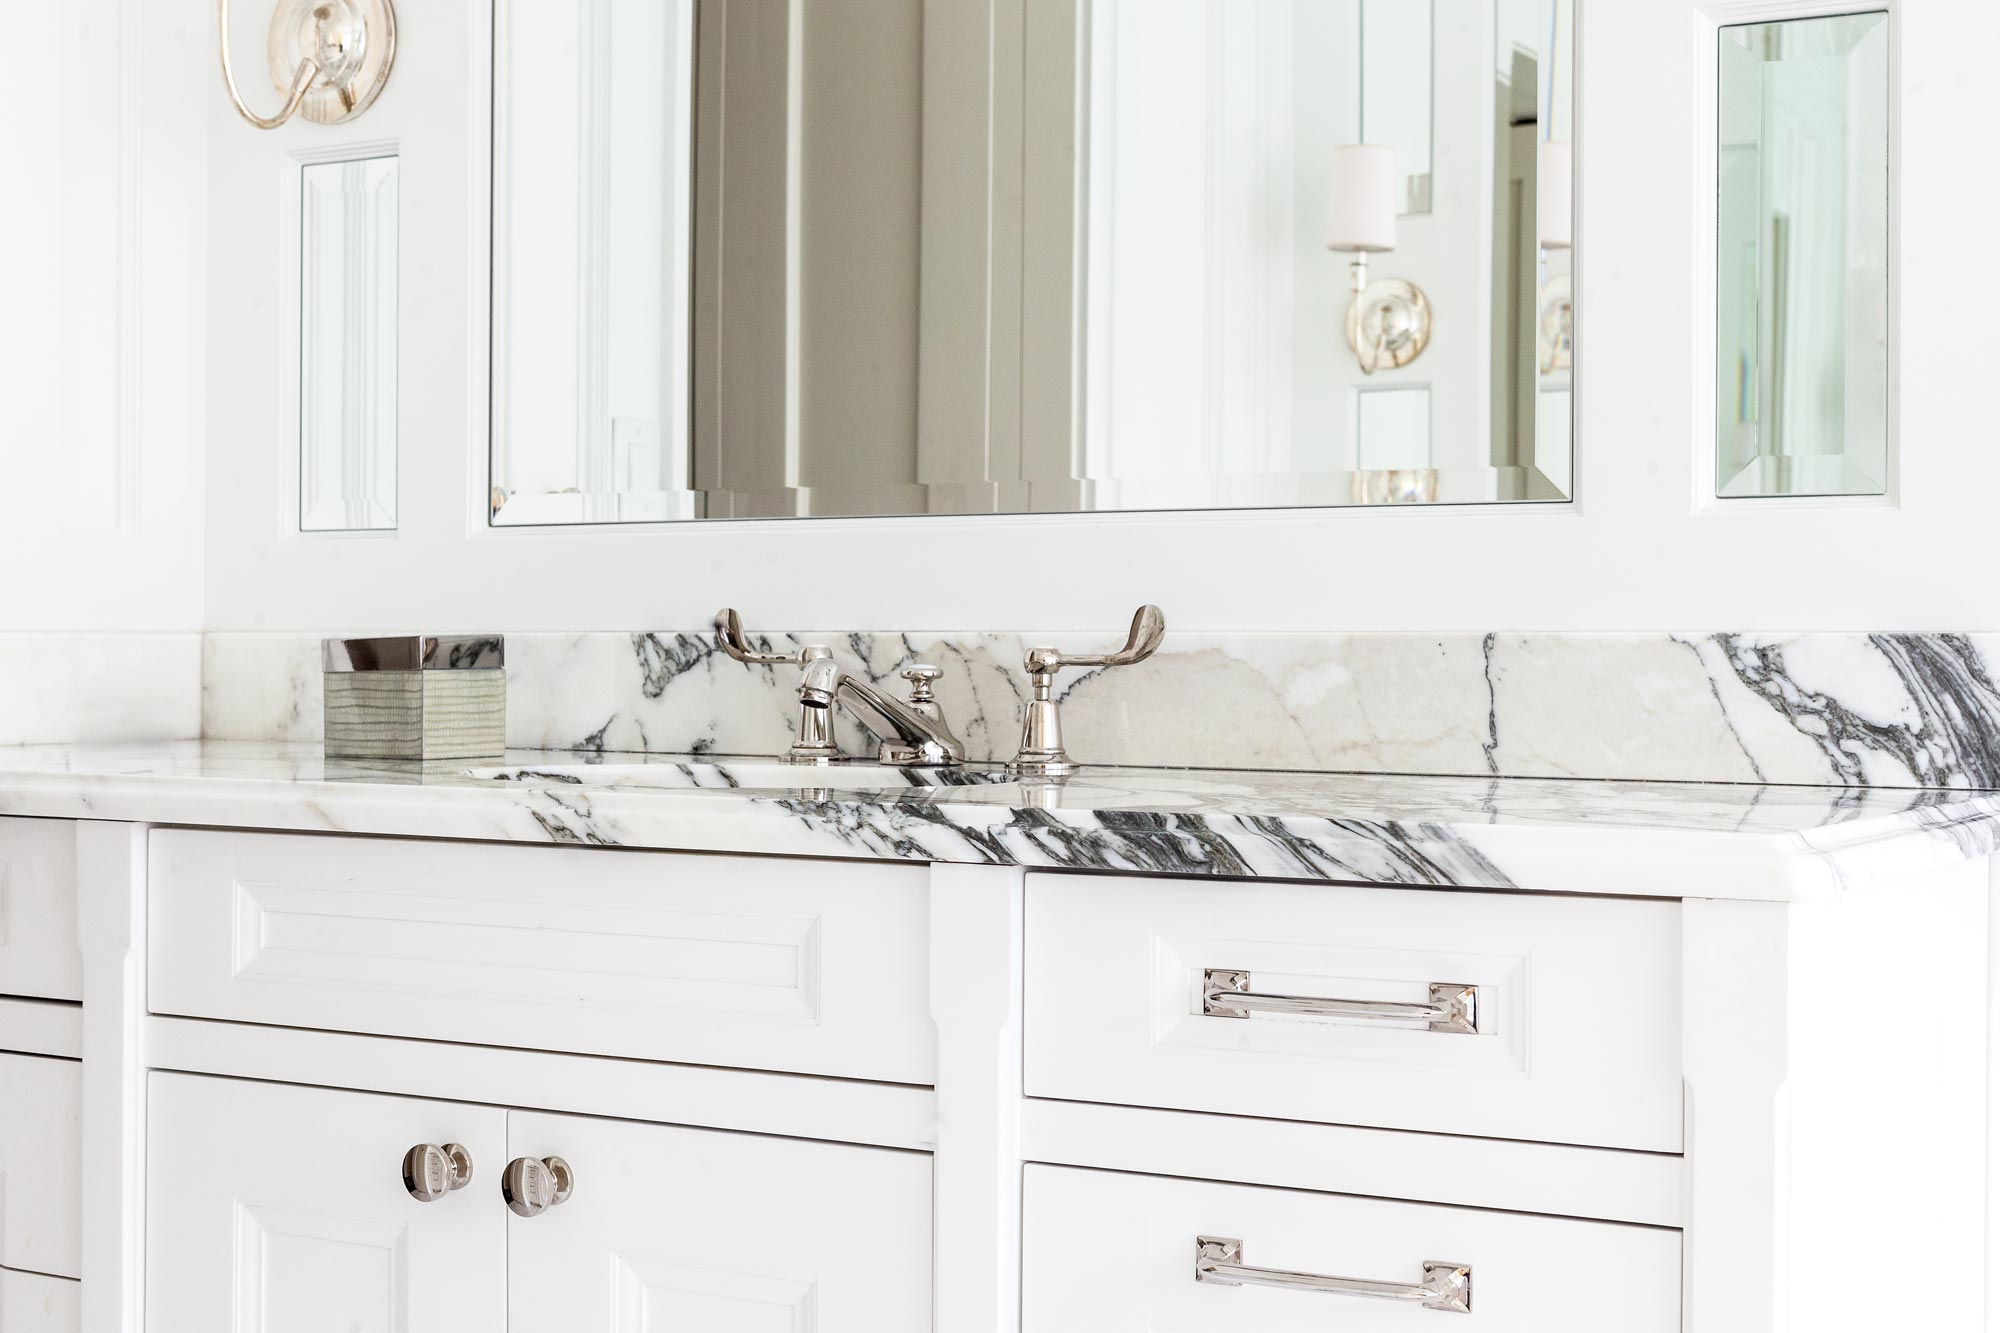 chicago luxury home bathroom black and white stone countertop